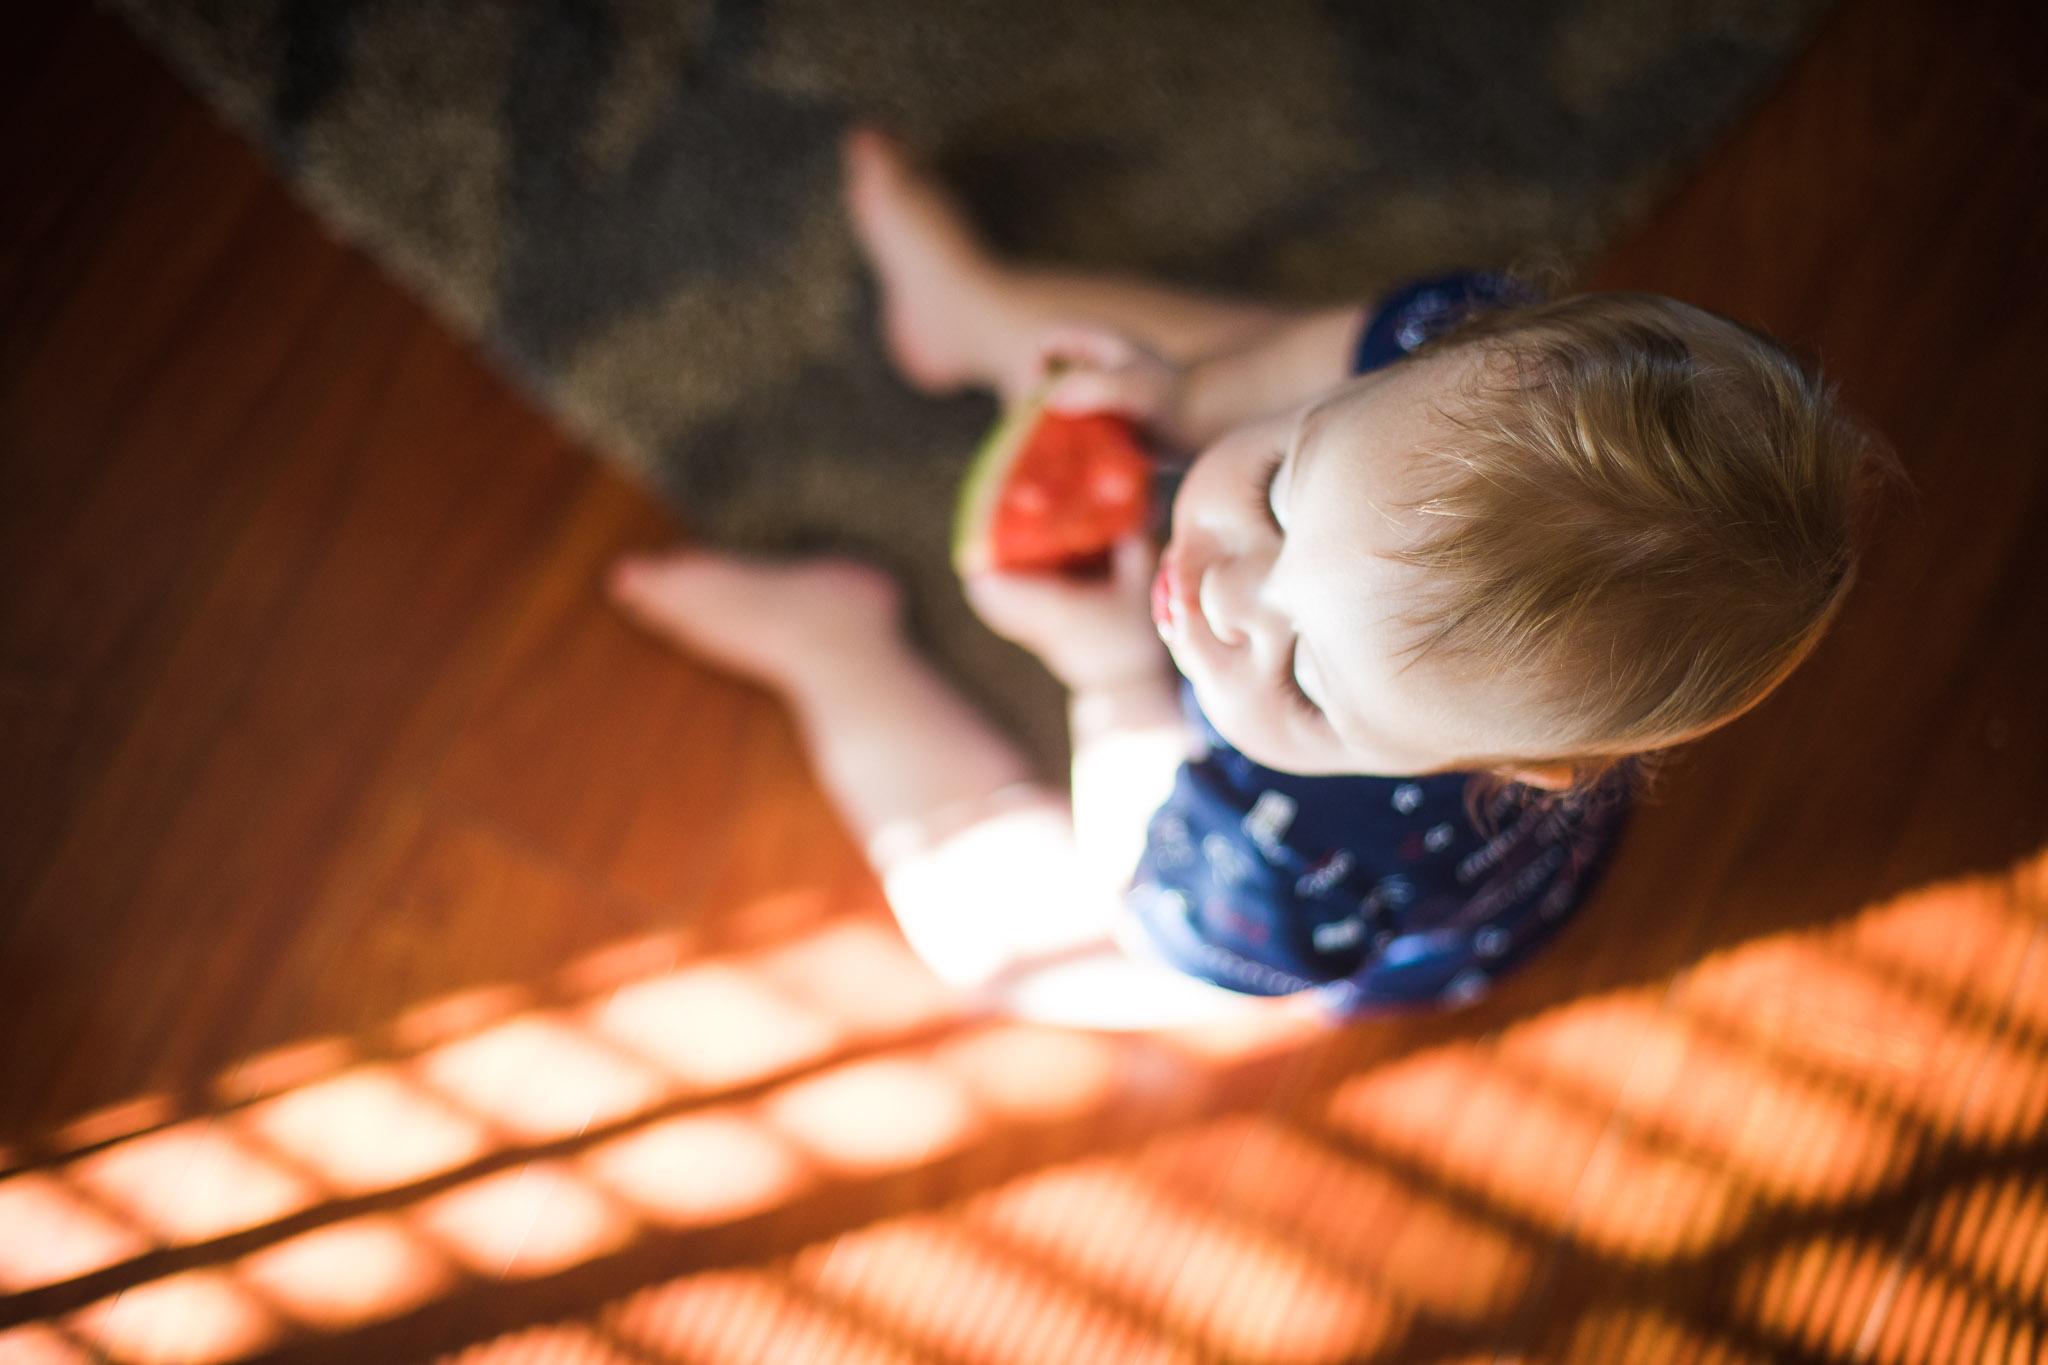 Archer_Inspired_Photography_Watermelon_Baby_Boy_Eating_Lifestyle_Photographer_California-7.jpg